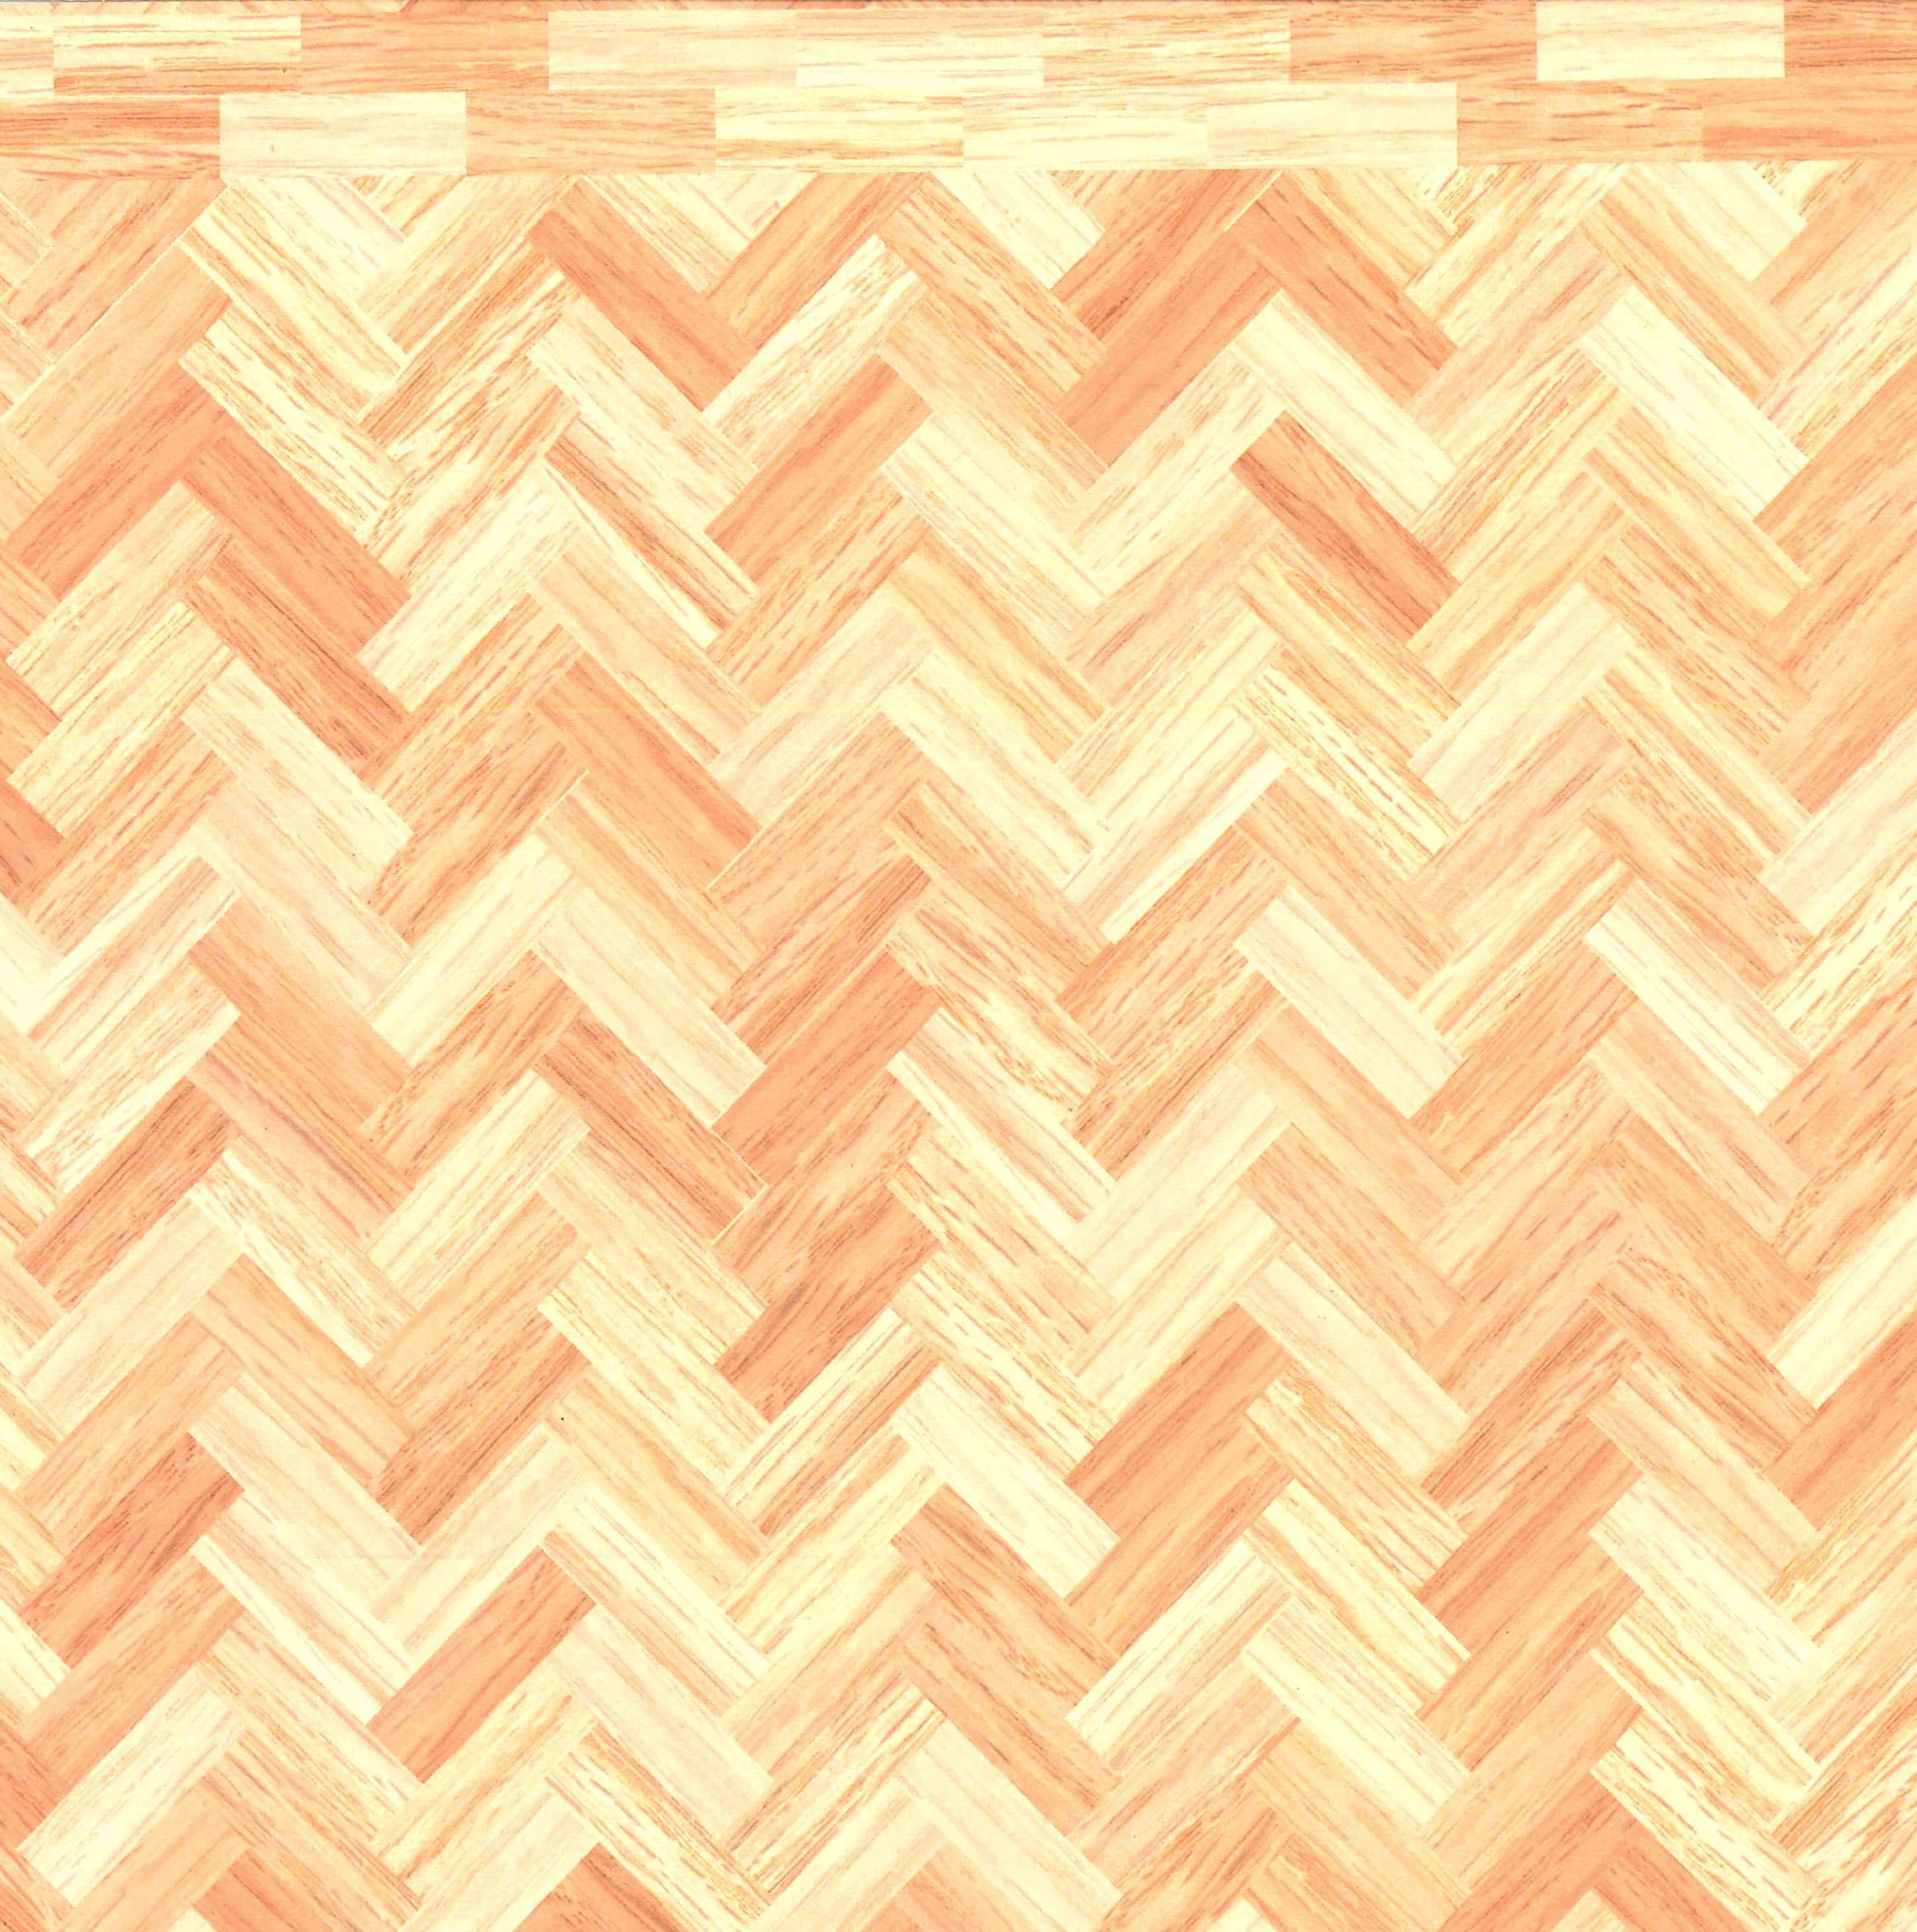 Polished Parquet Flooring Paper